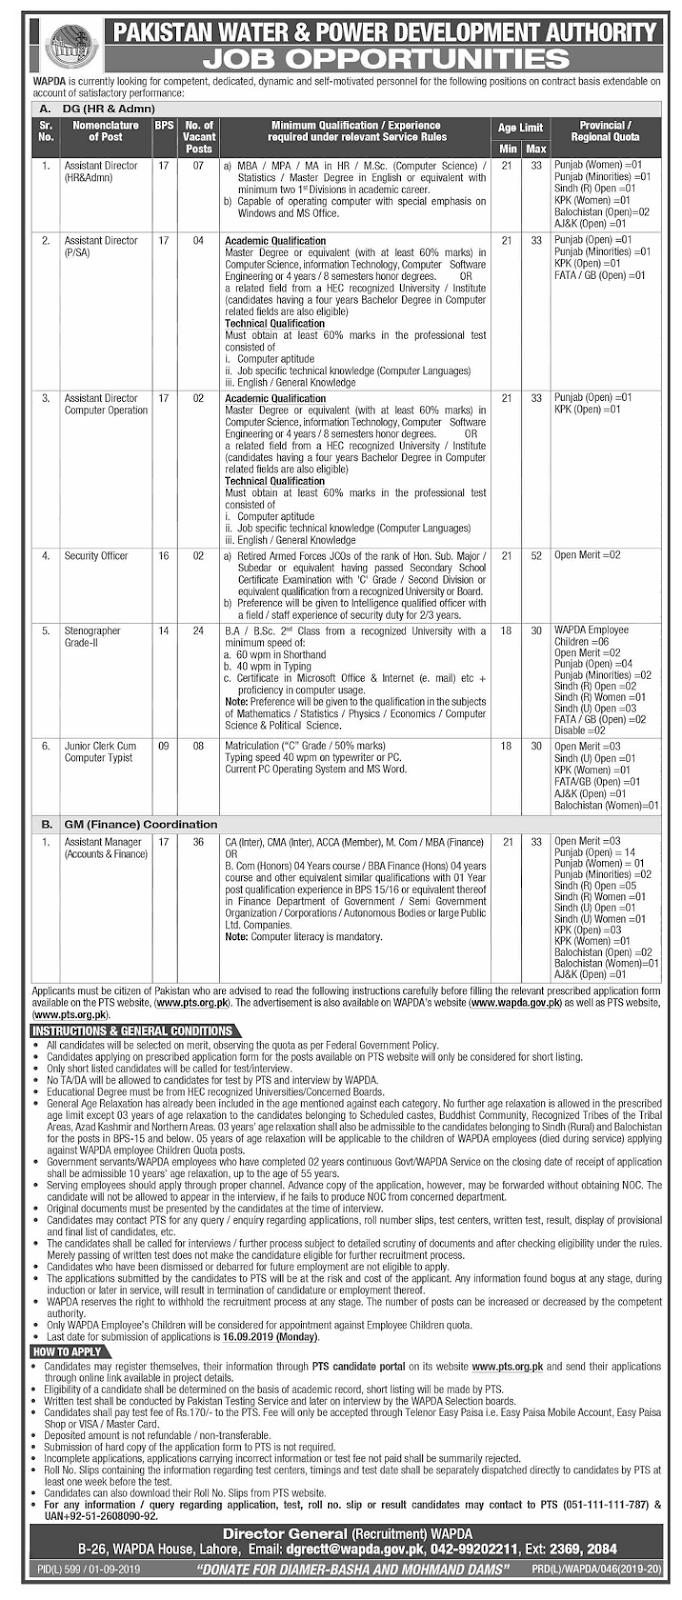 Pakistan Water & Power Development Authority WAPDA Jobs 2019 Apply via PTS